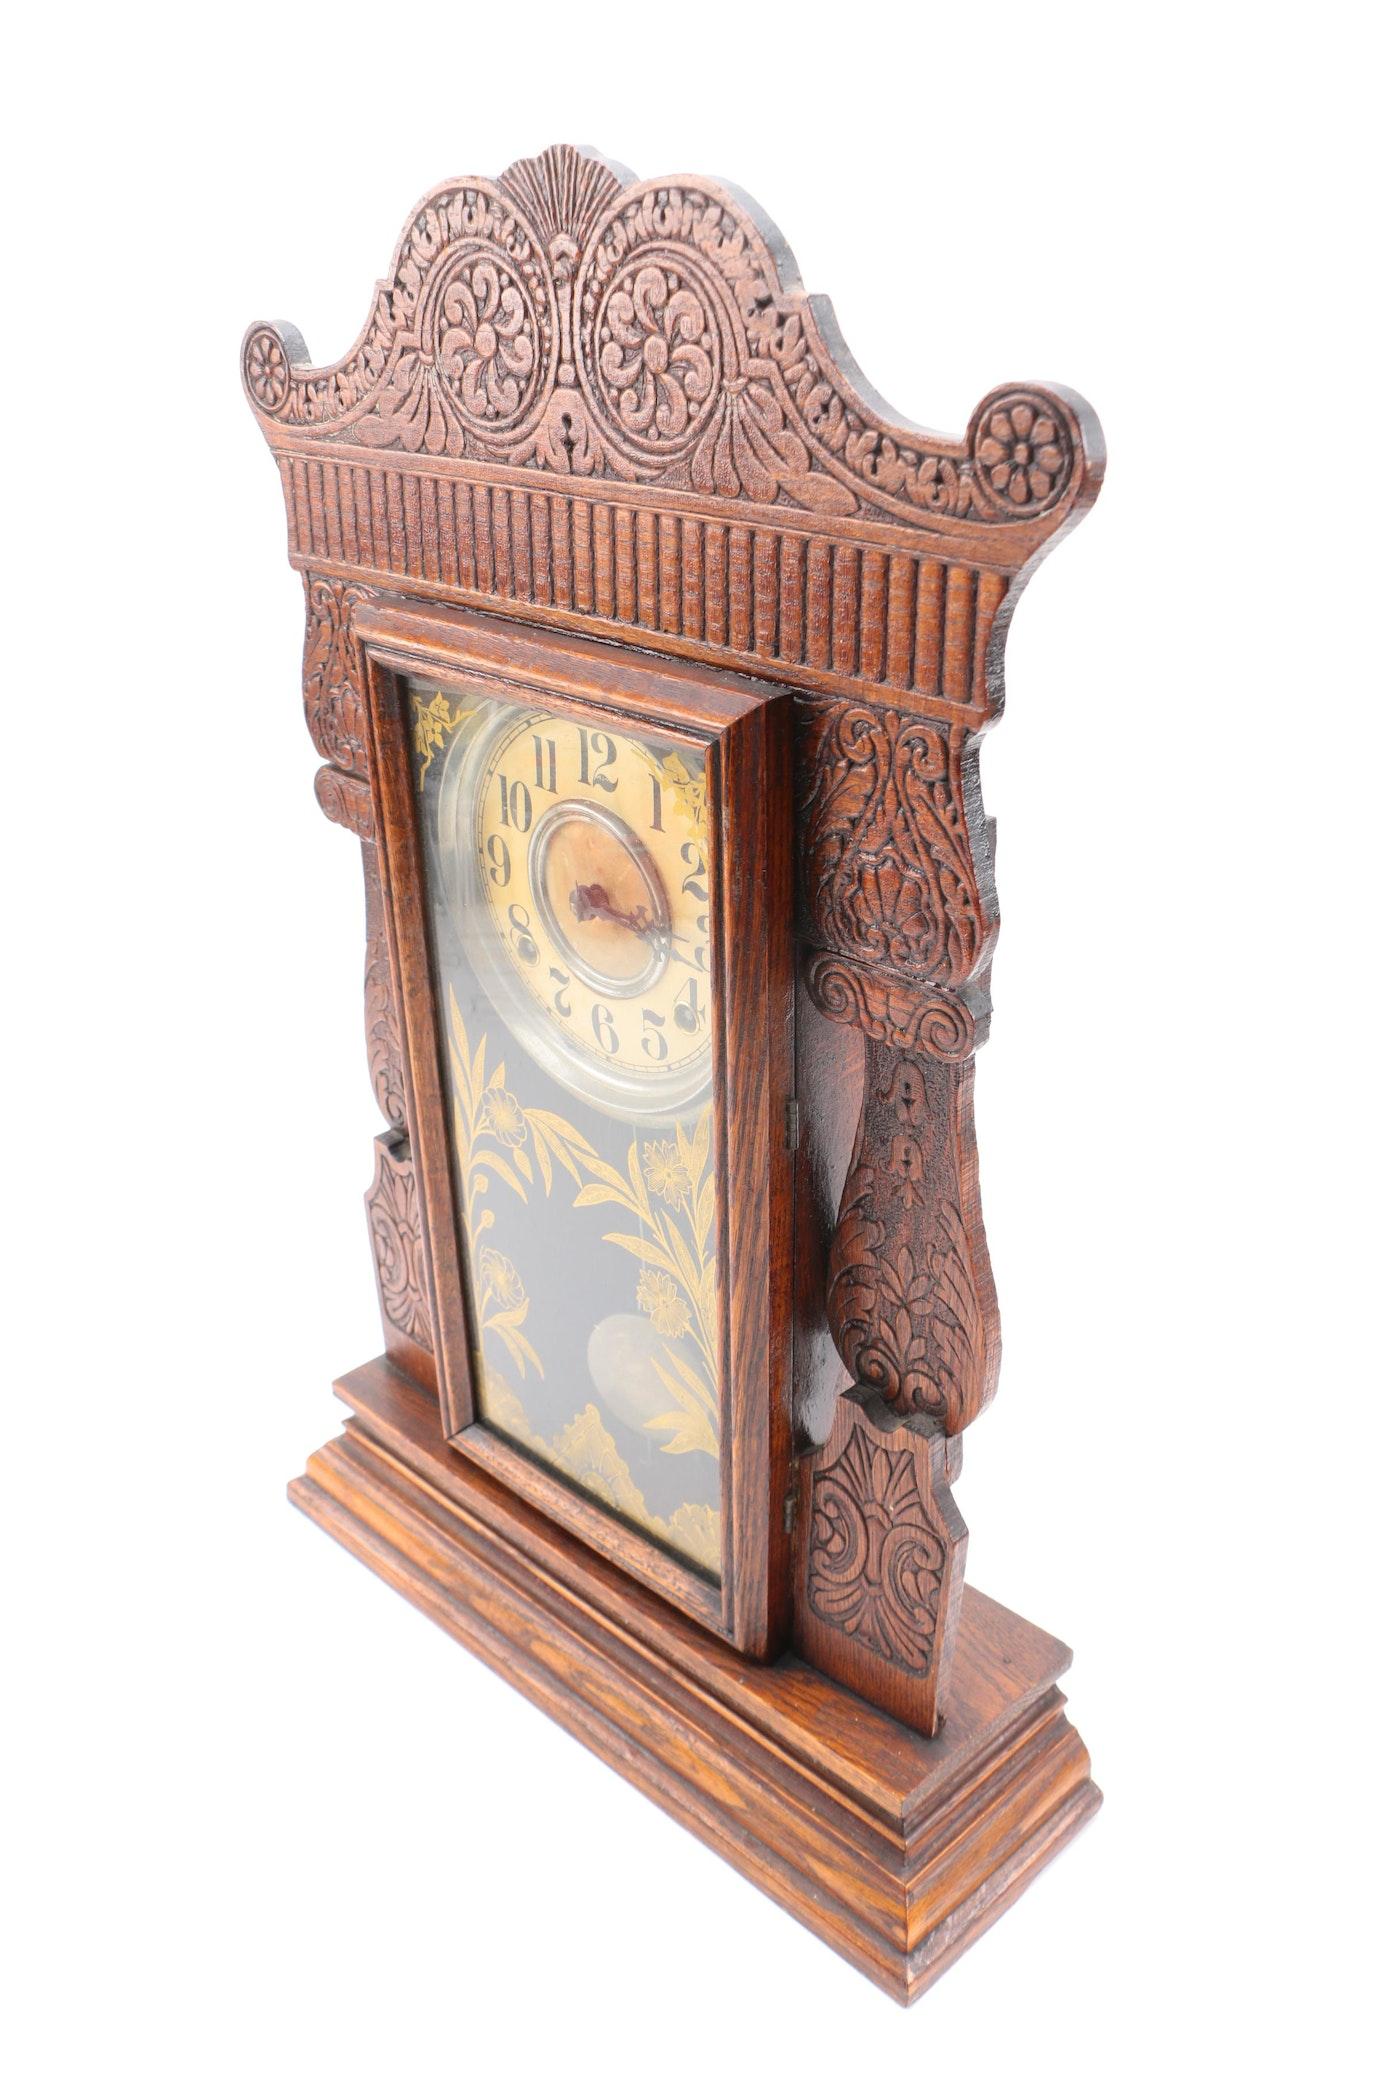 Antique William L Gilbert Quot Jewel Quot Mantel Clock Ebth